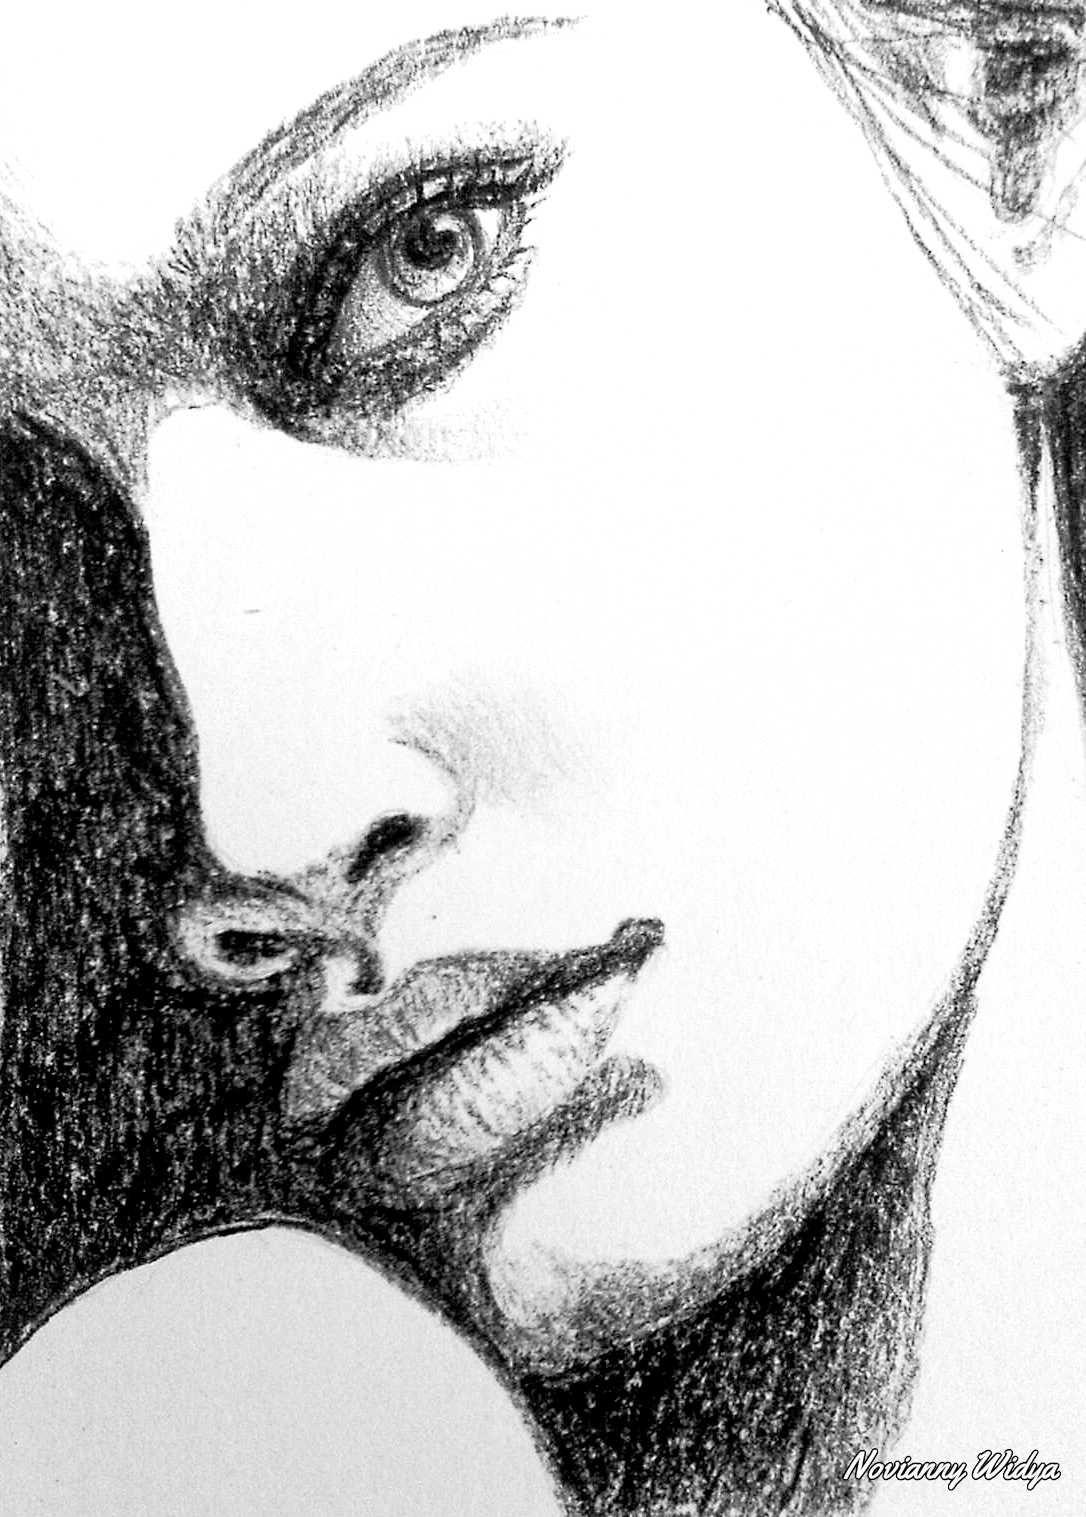 Charcoal sketch 251213 novianny widya